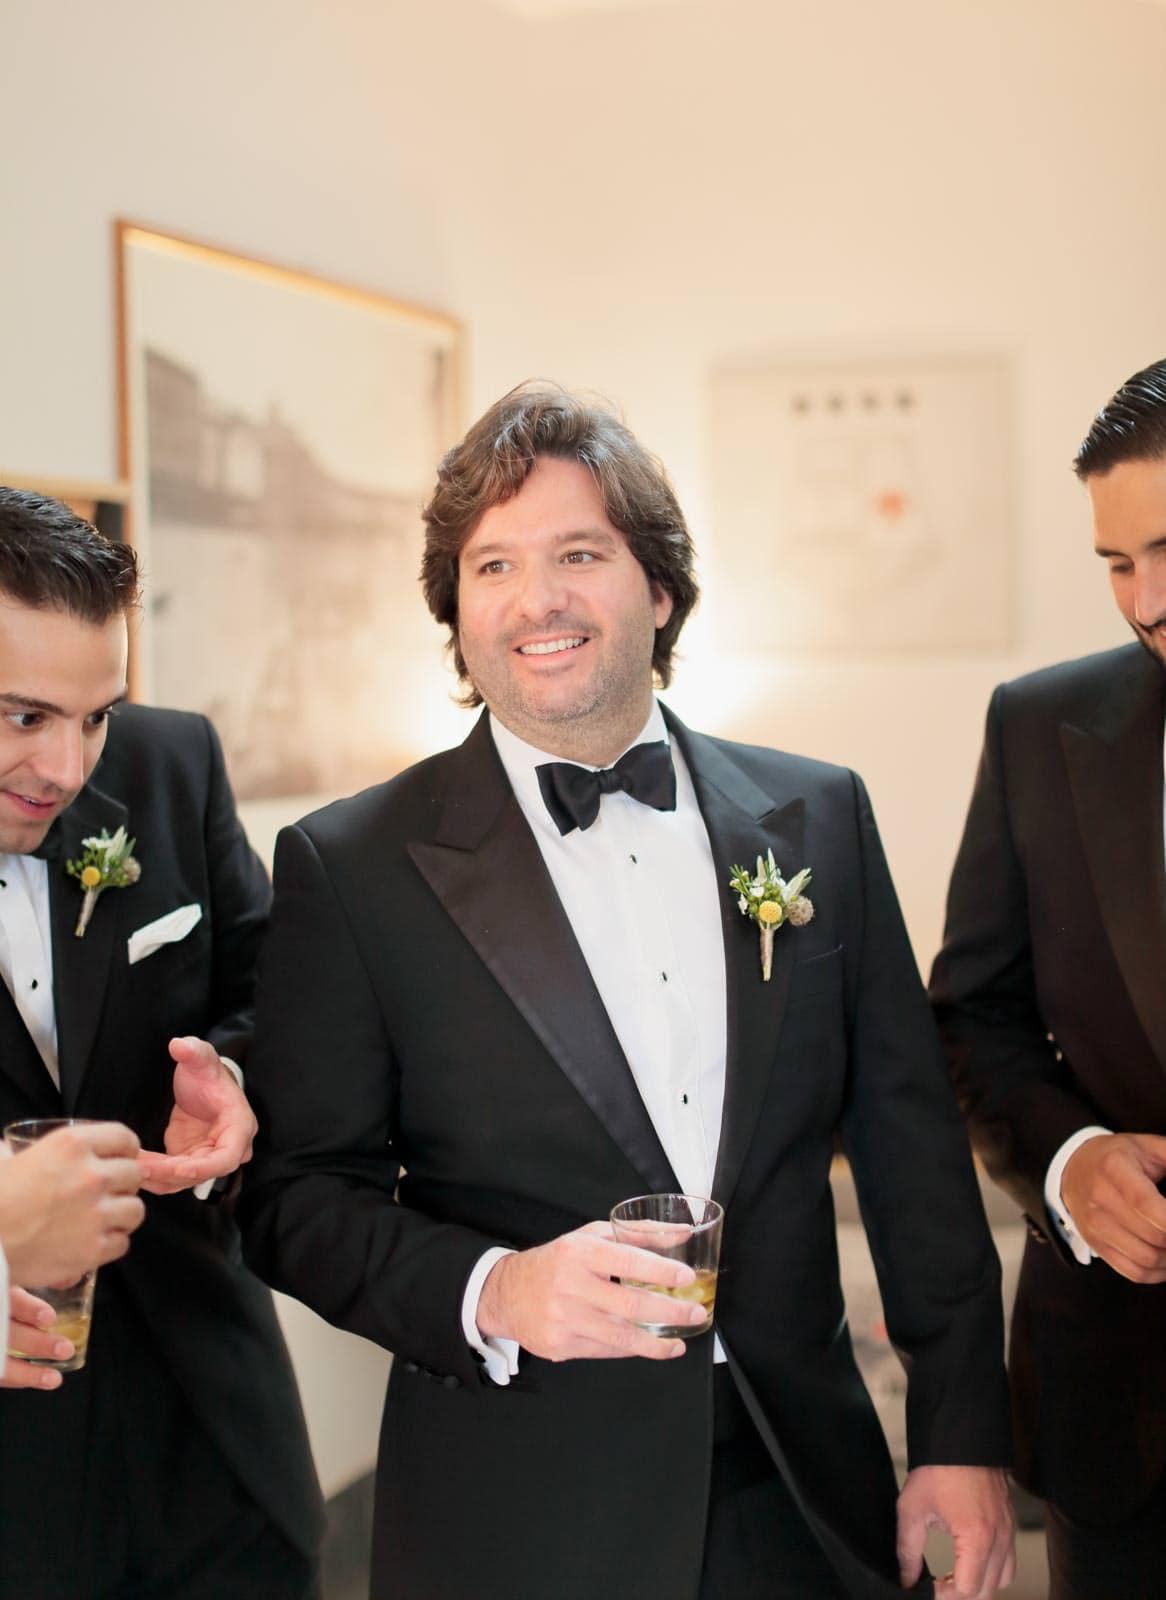 groom toasting the groomsmen before the ceremony